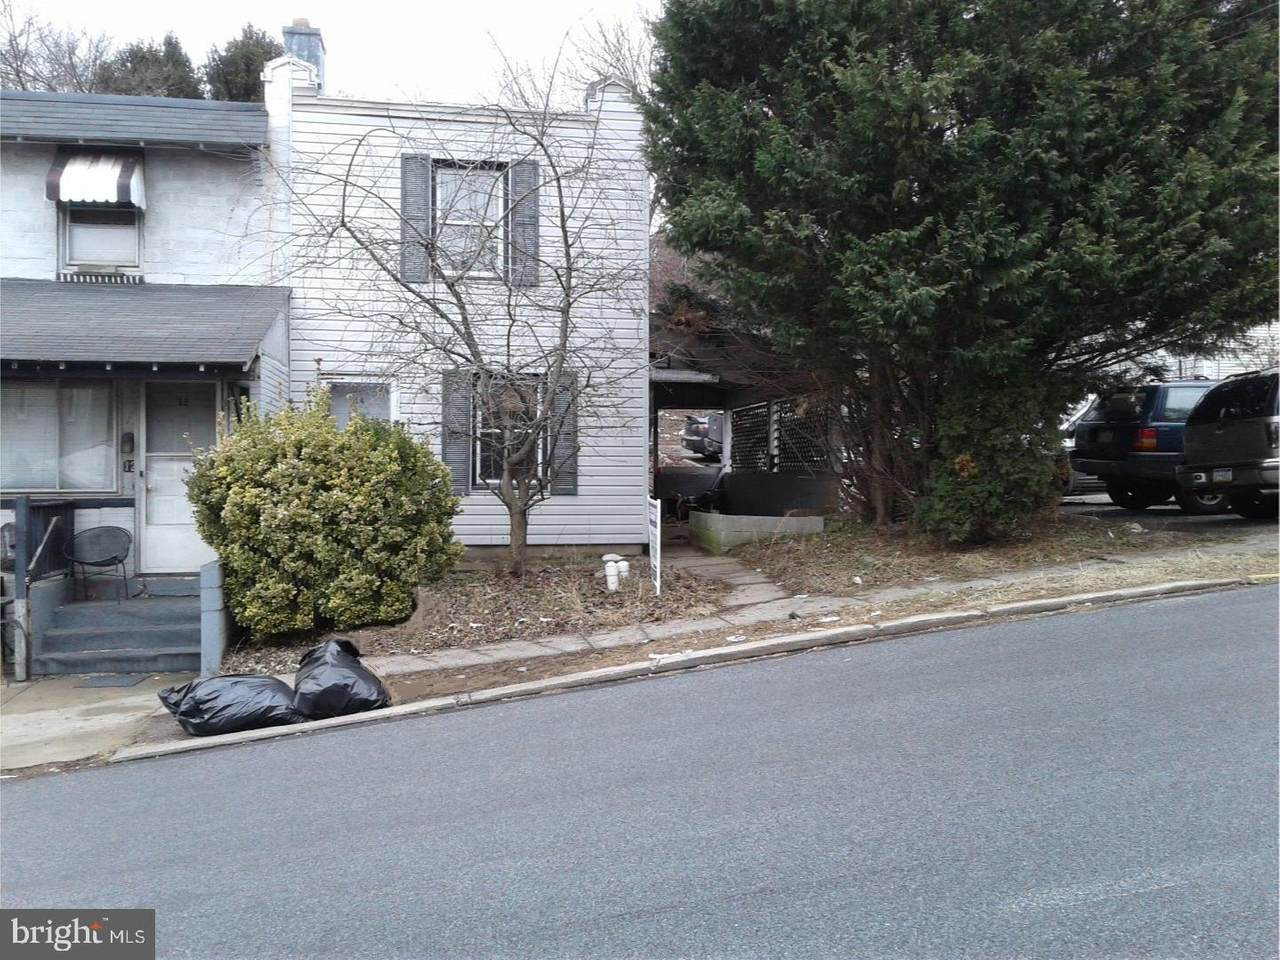 14 Birch Street - Photo 1